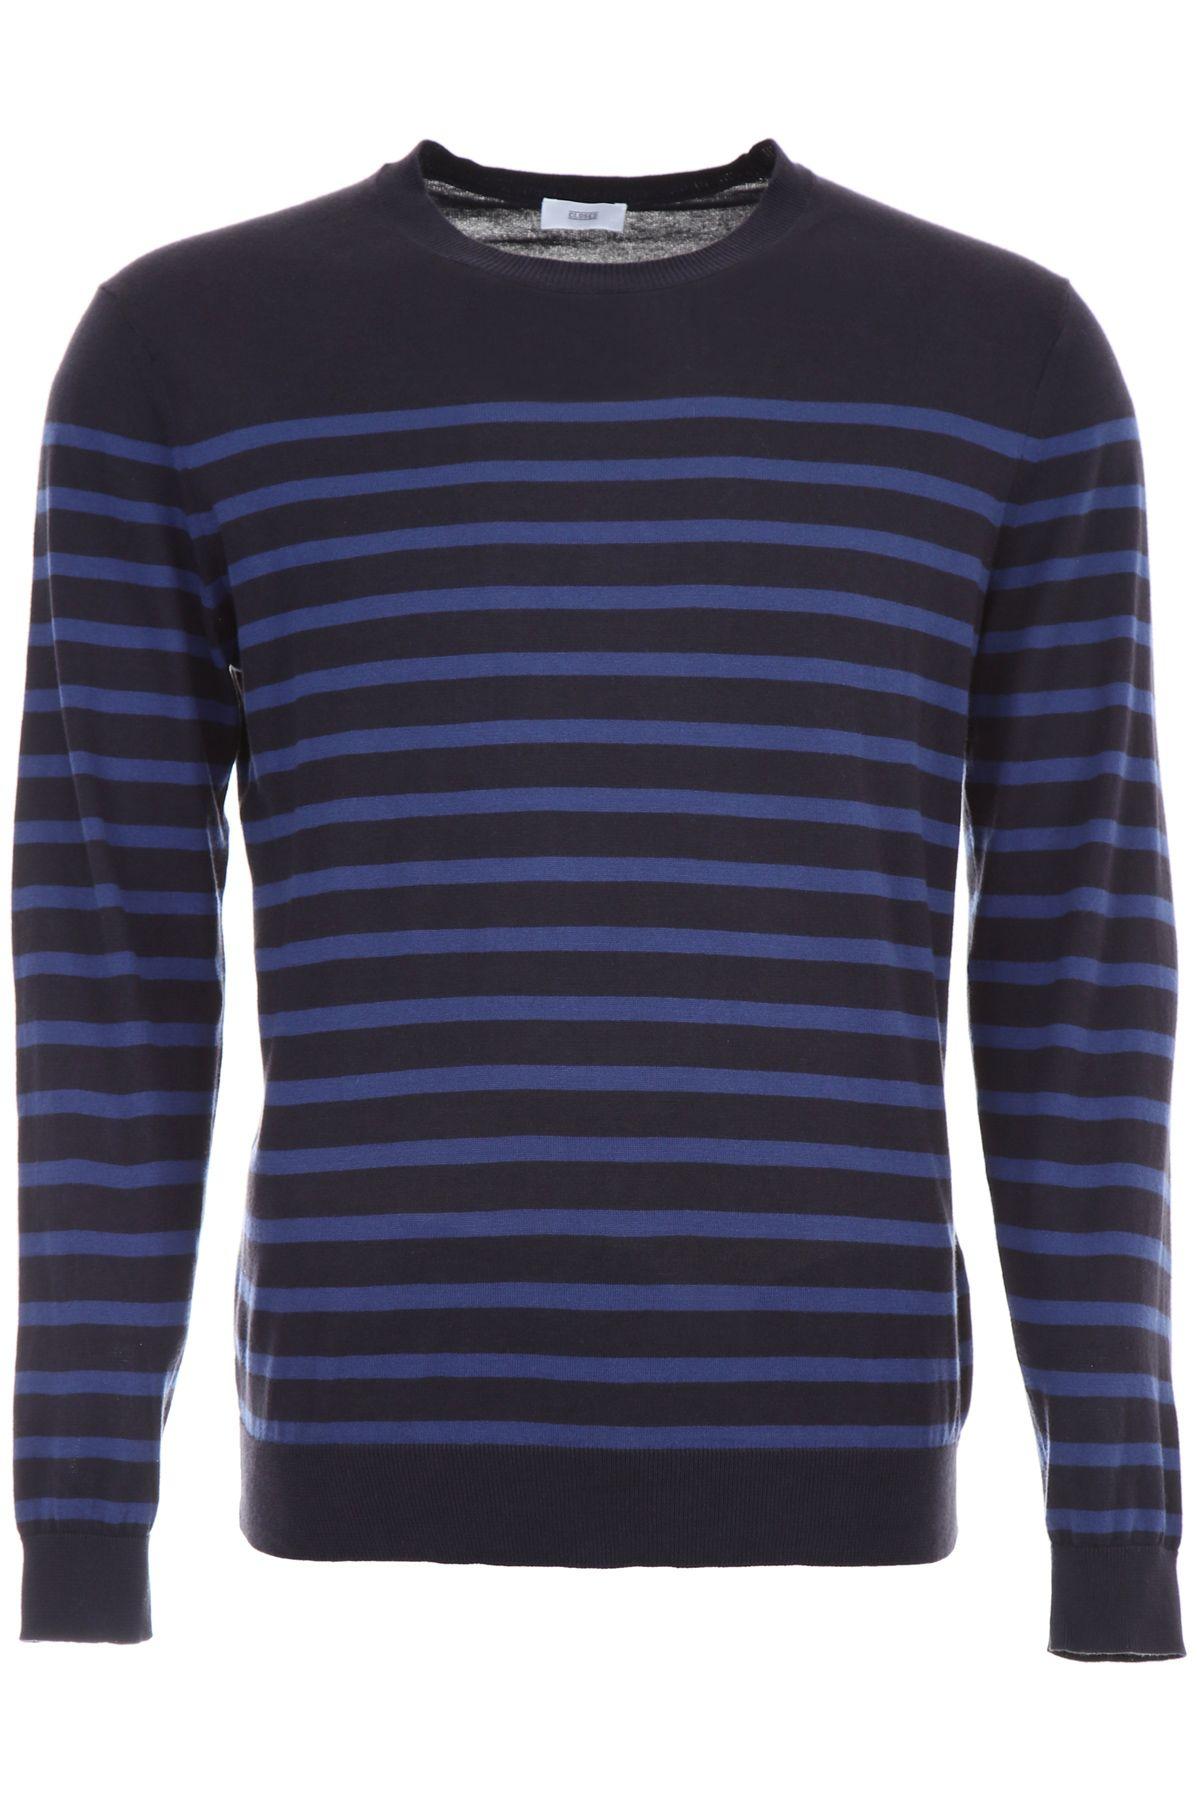 TOPWEAR - Sweatshirts Junk de Luxe New Styles Cheap Price Fpq6MlPuE